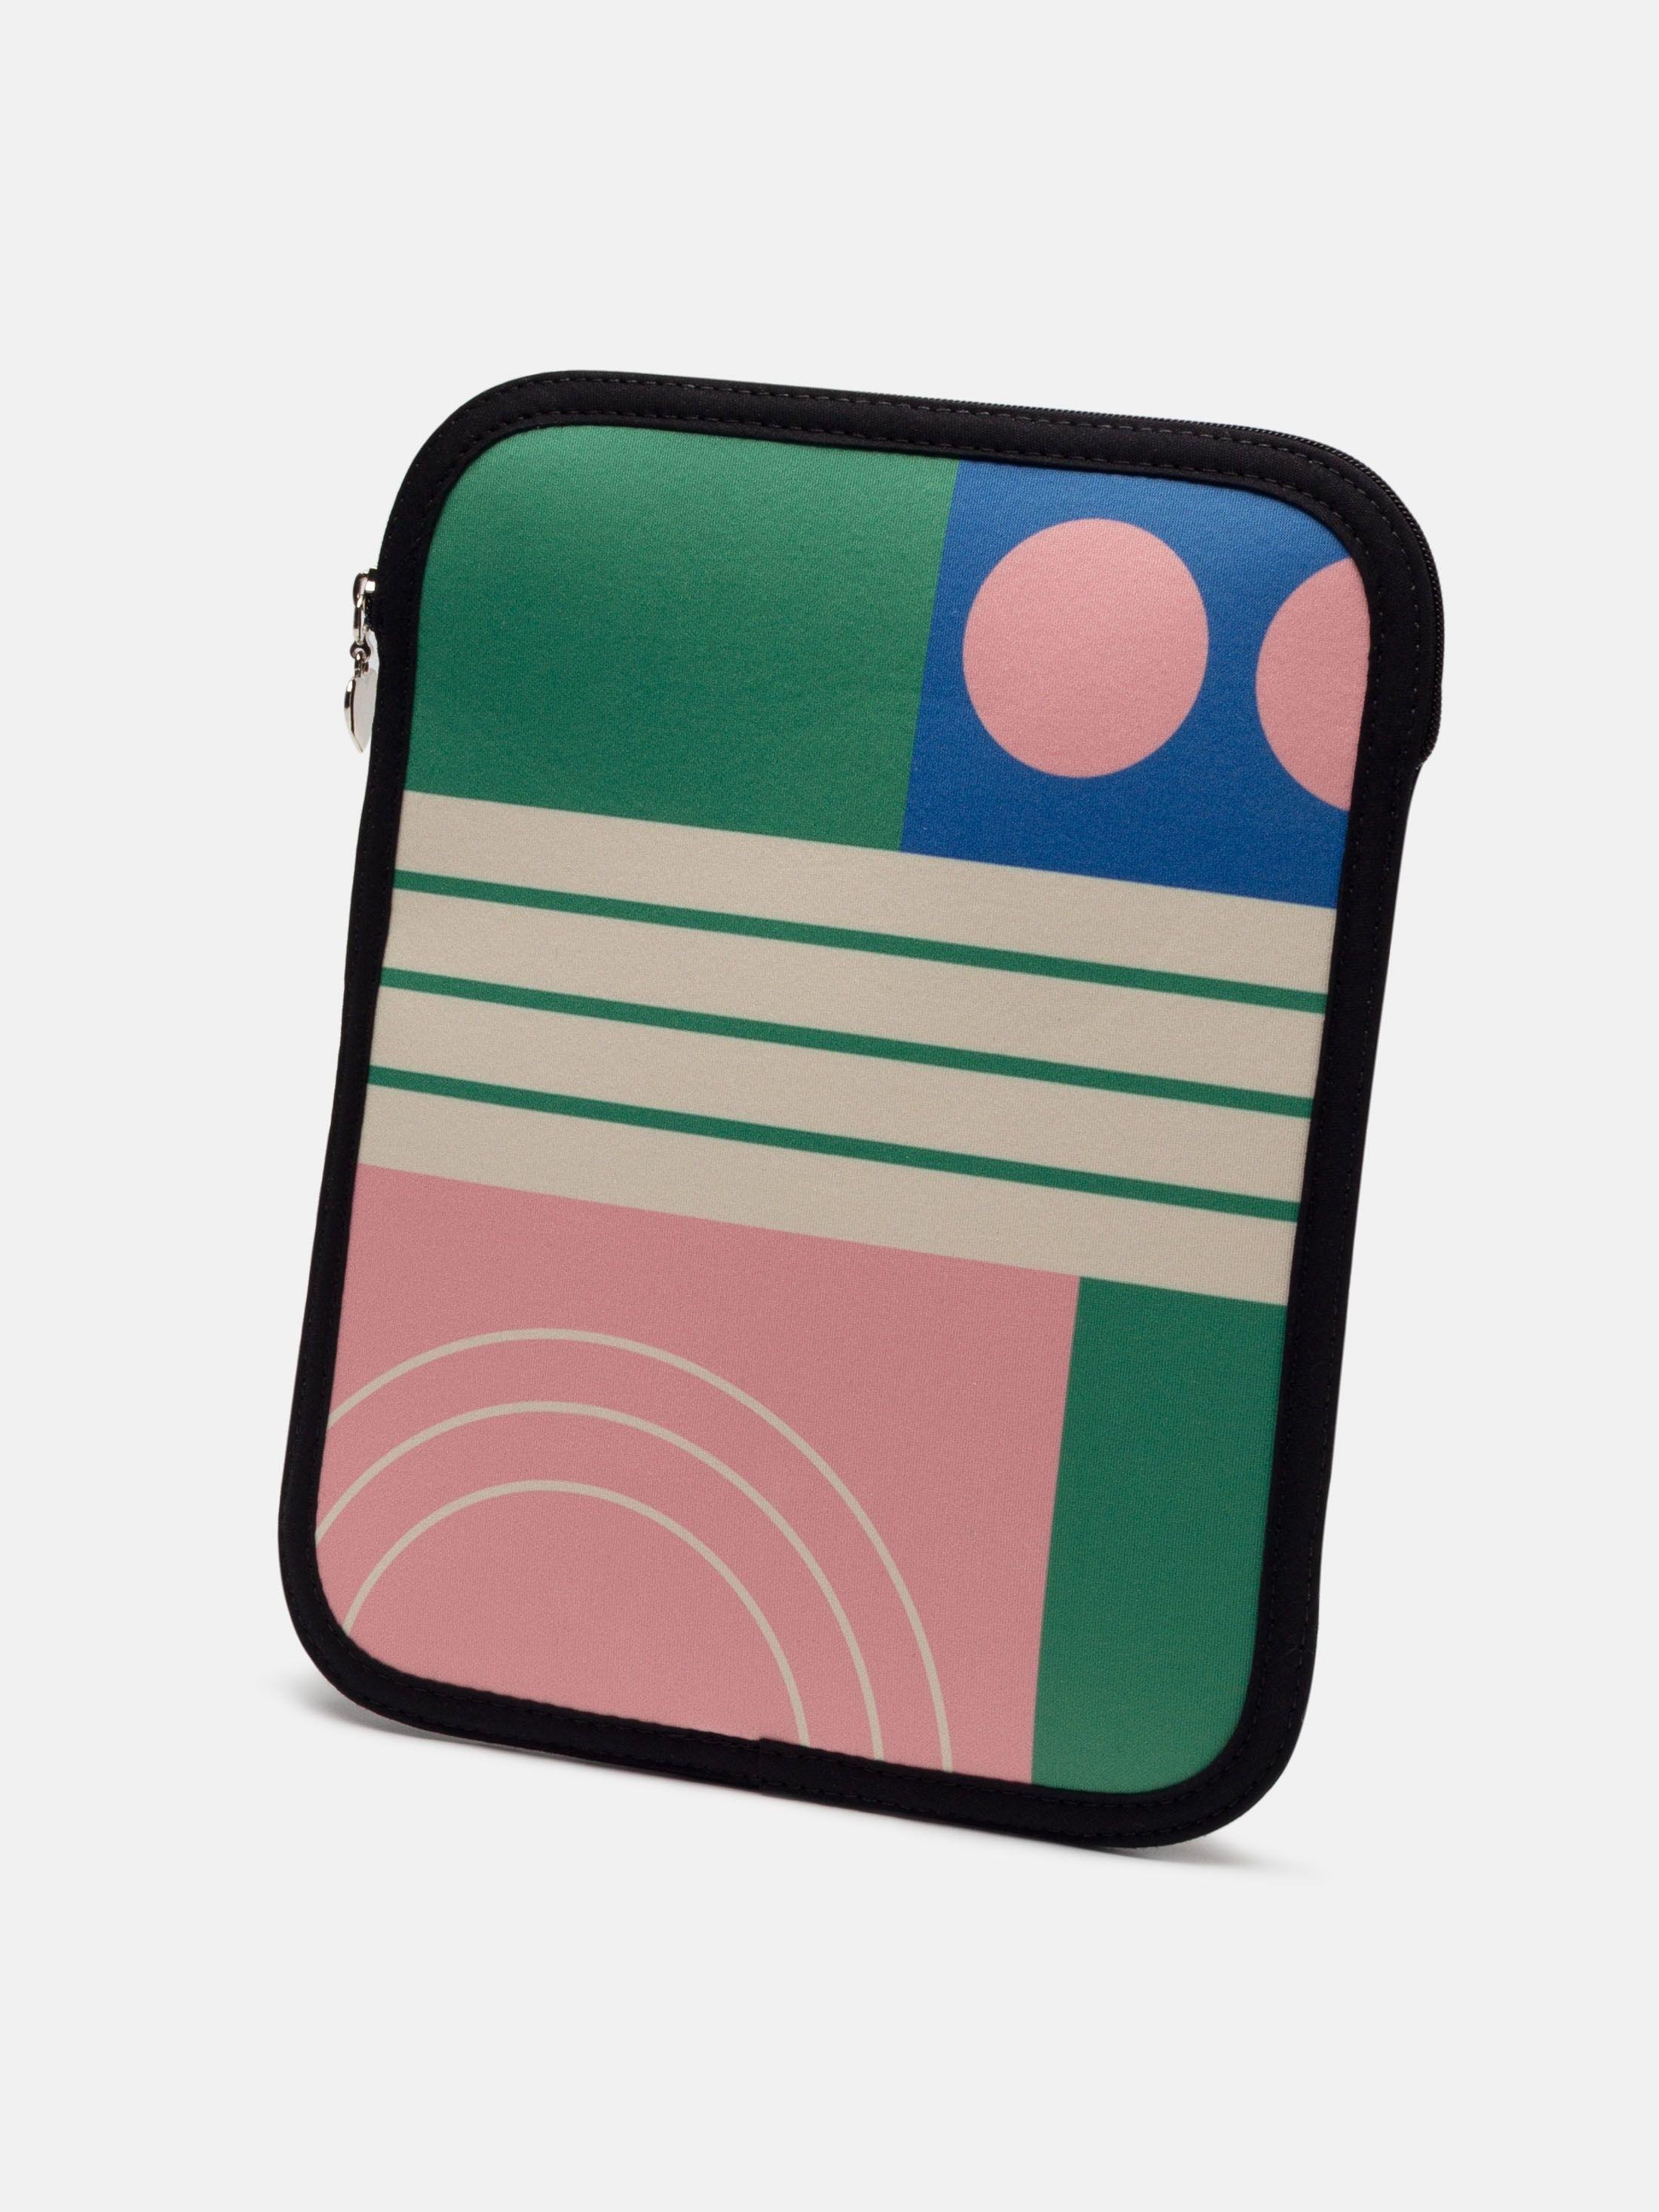 Housse iPad personnalisable